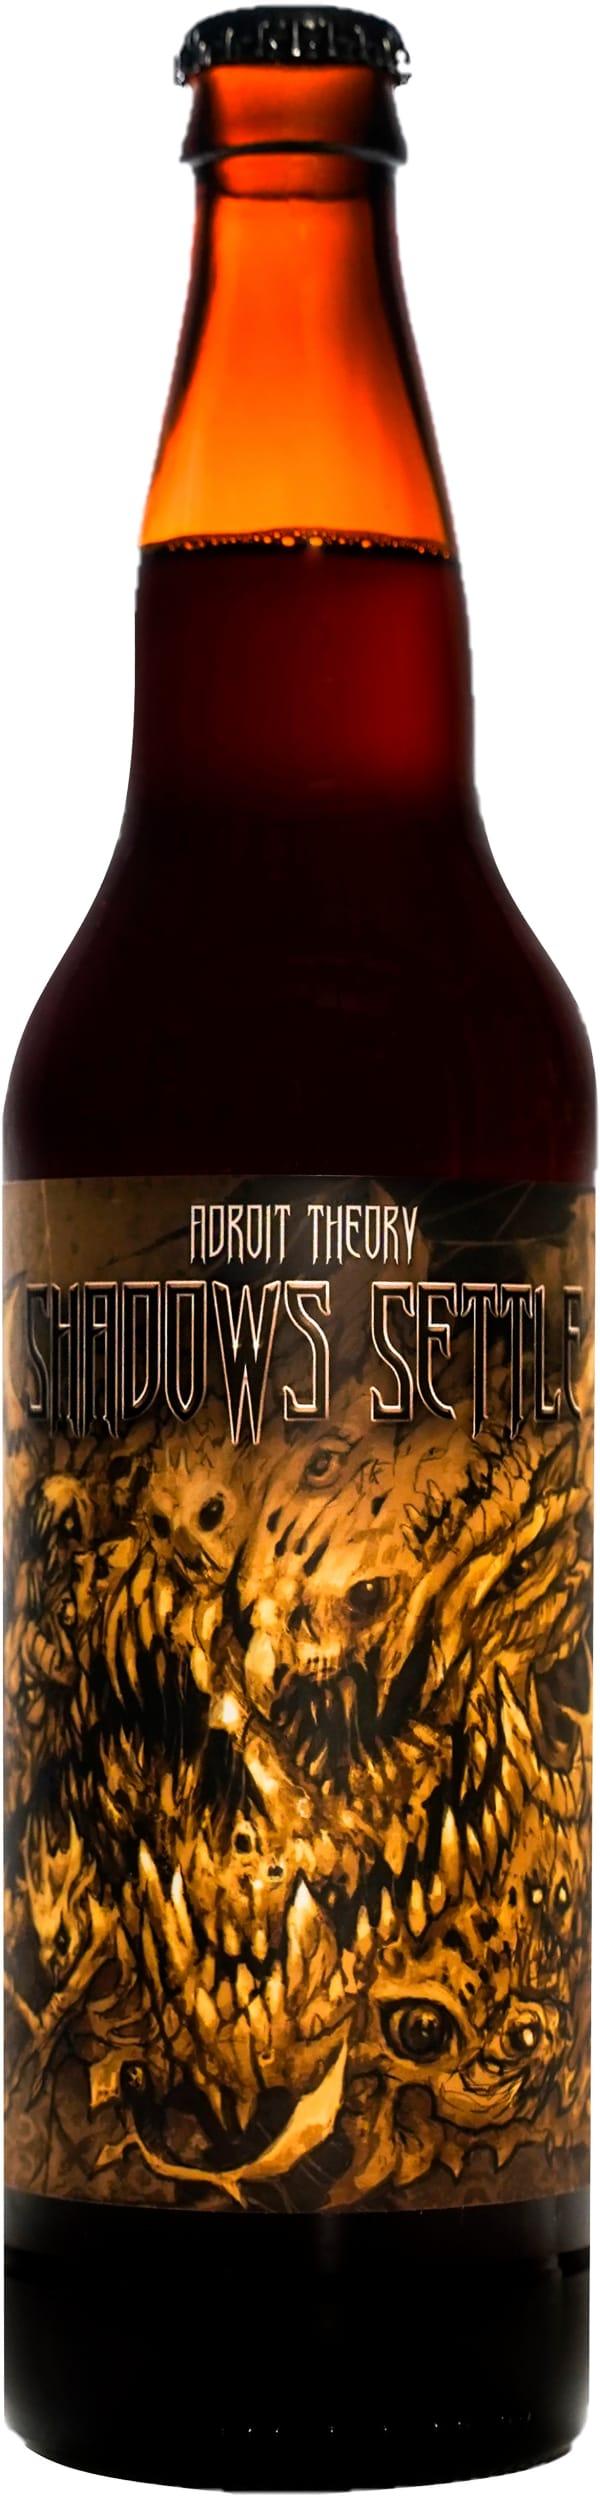 Adroit Theory Shadow Settle Barleywine